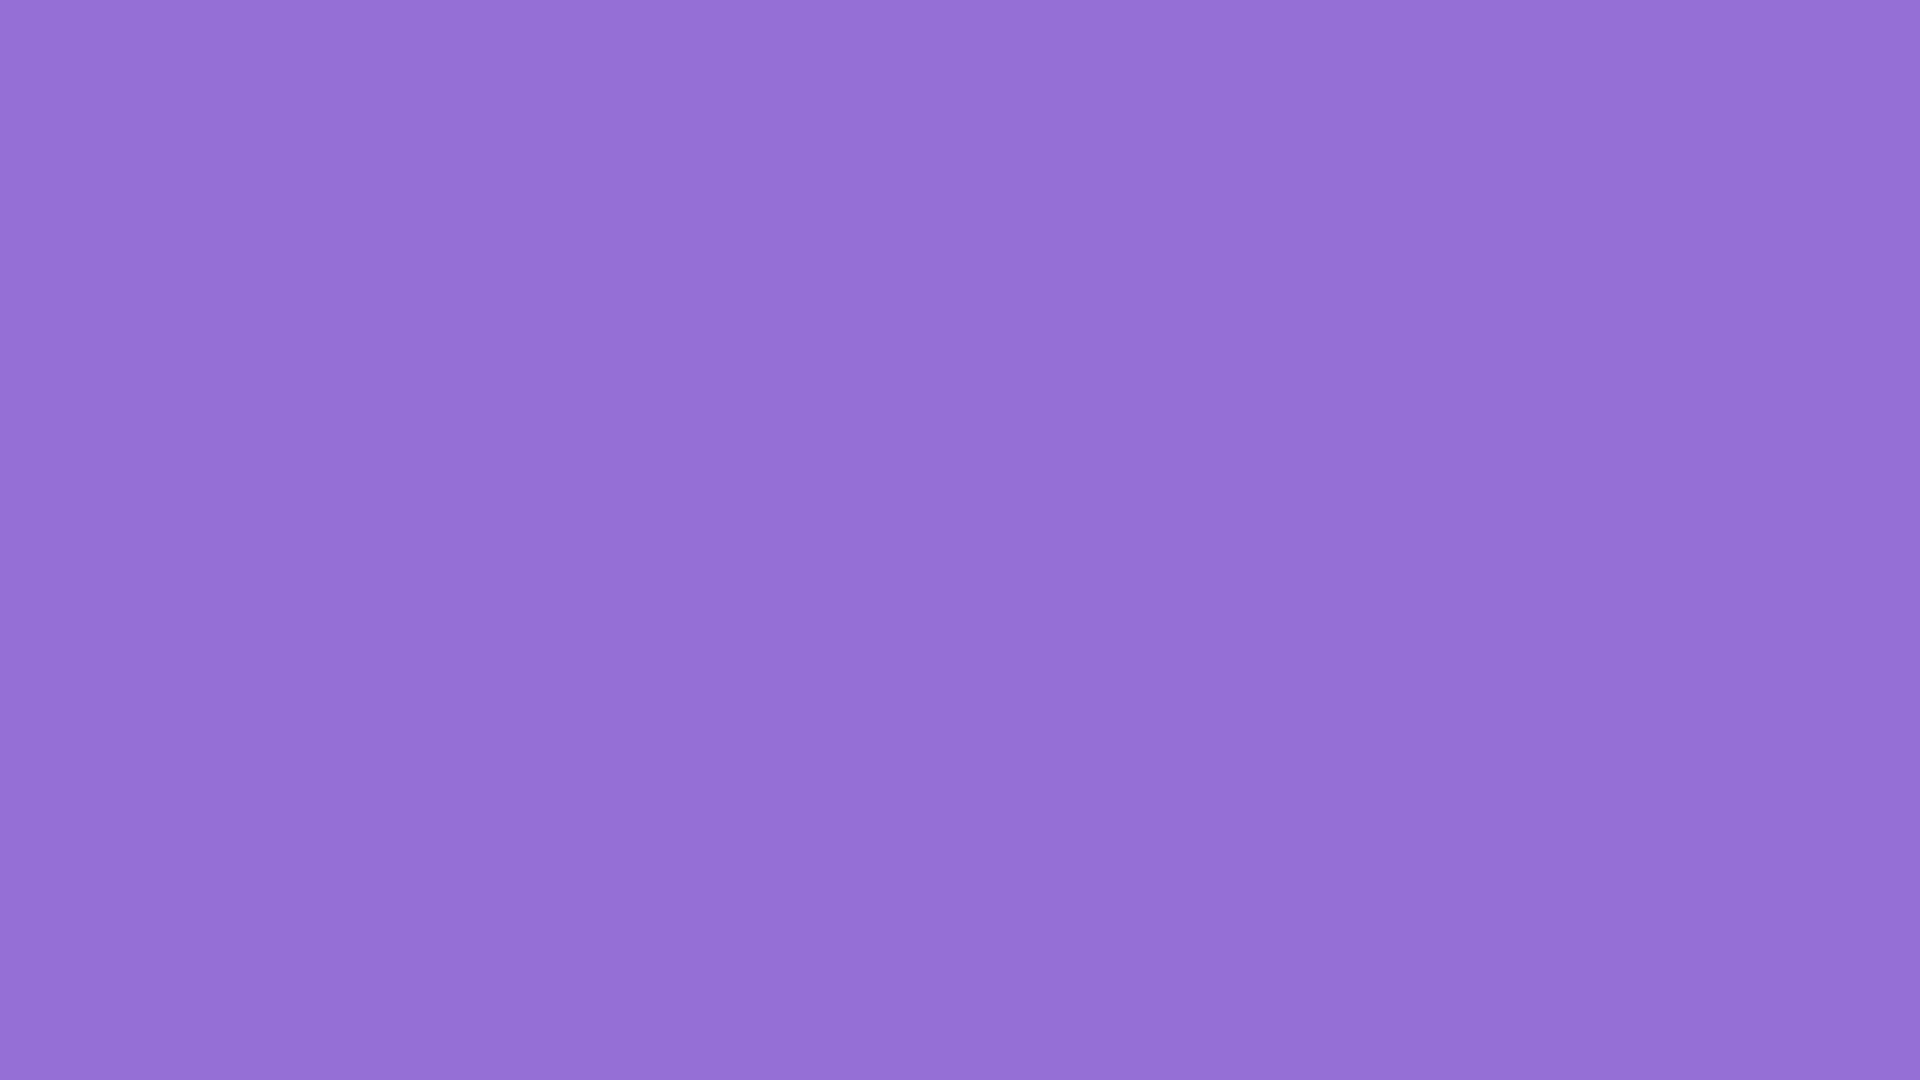 Design A Wallpaper For Iphone Plain Color Desktop Wallpaper 64 Images